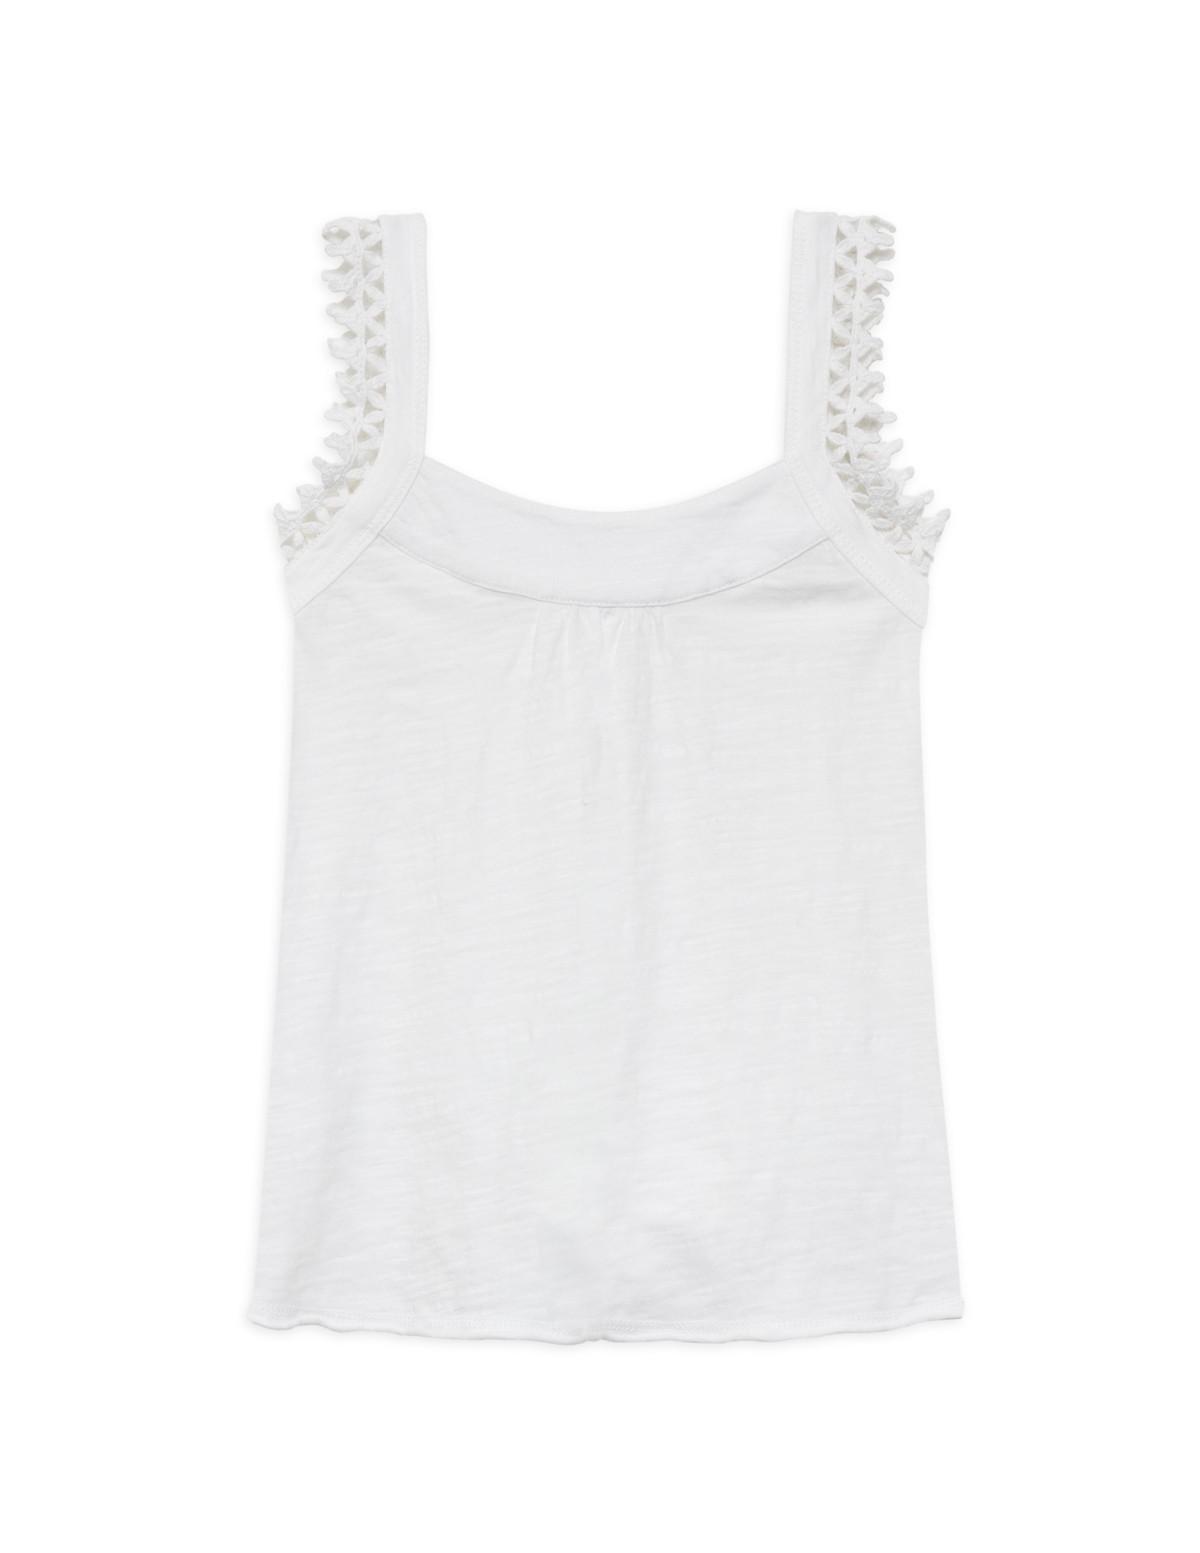 Camiseta tirantes algodón orgánico niña